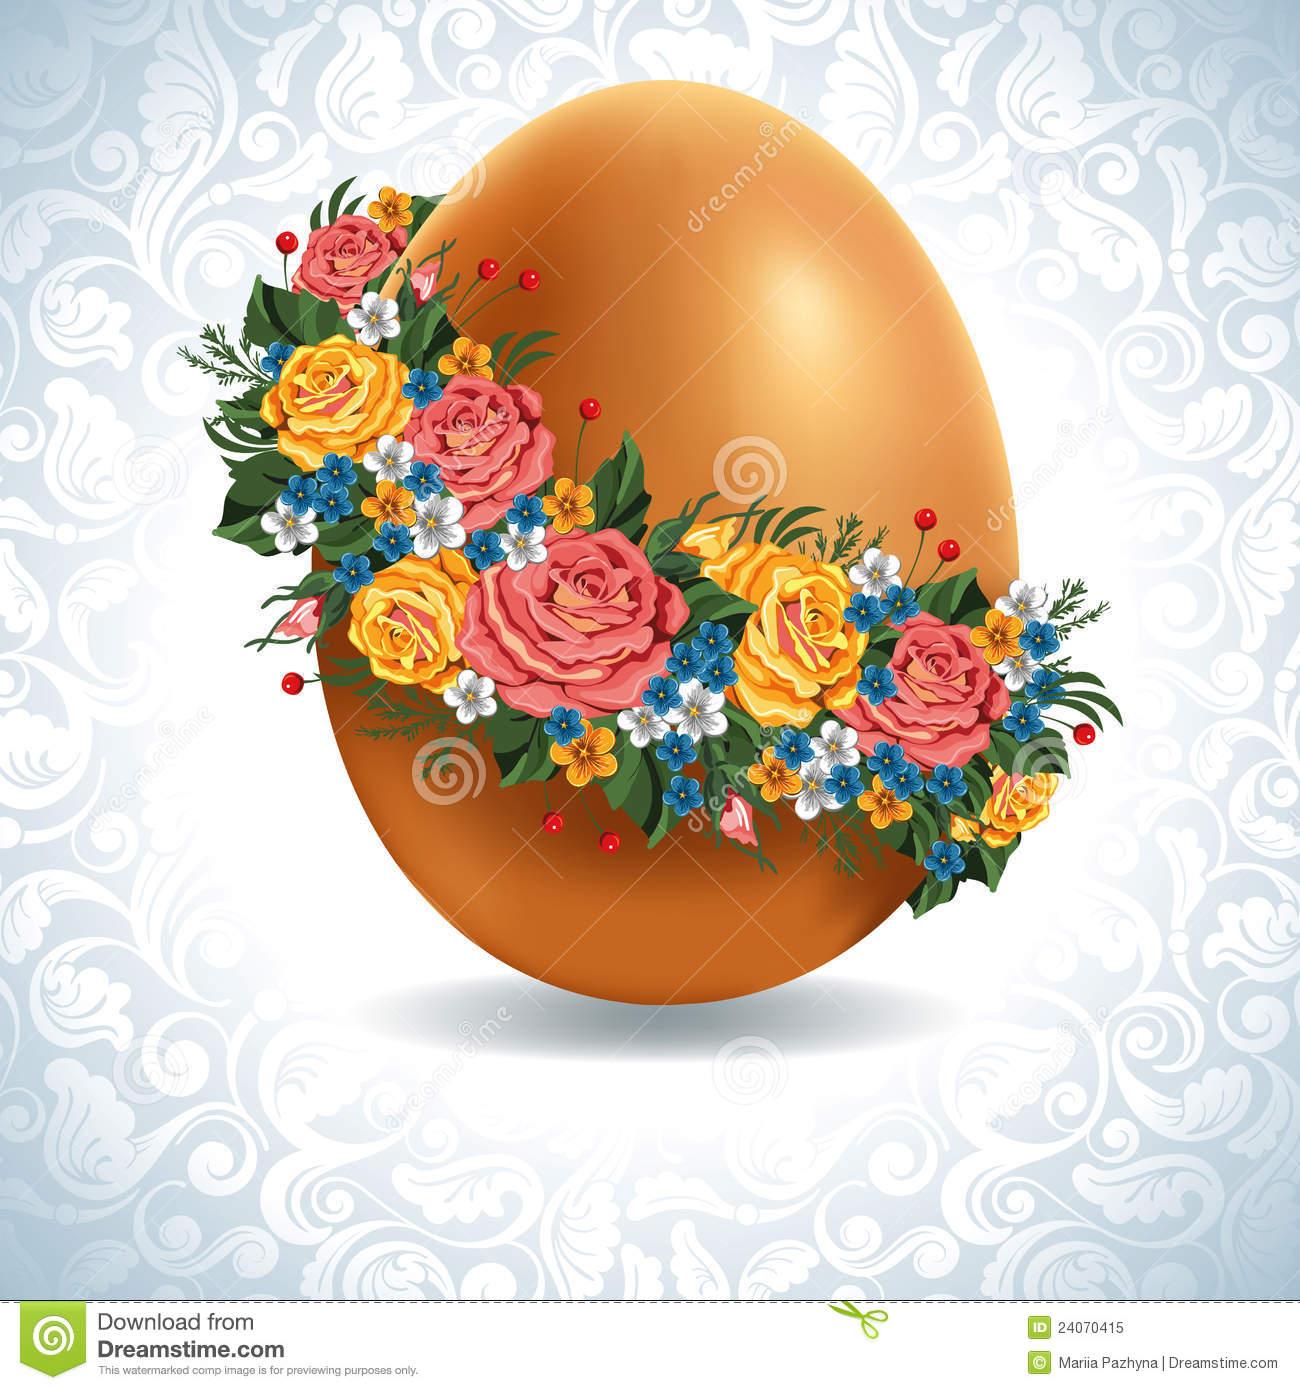 Free vintage easter egg clipart vector transparent library Vintage Easter Egg Royalty Free Stock Photo - Image: 24070415 vector transparent library